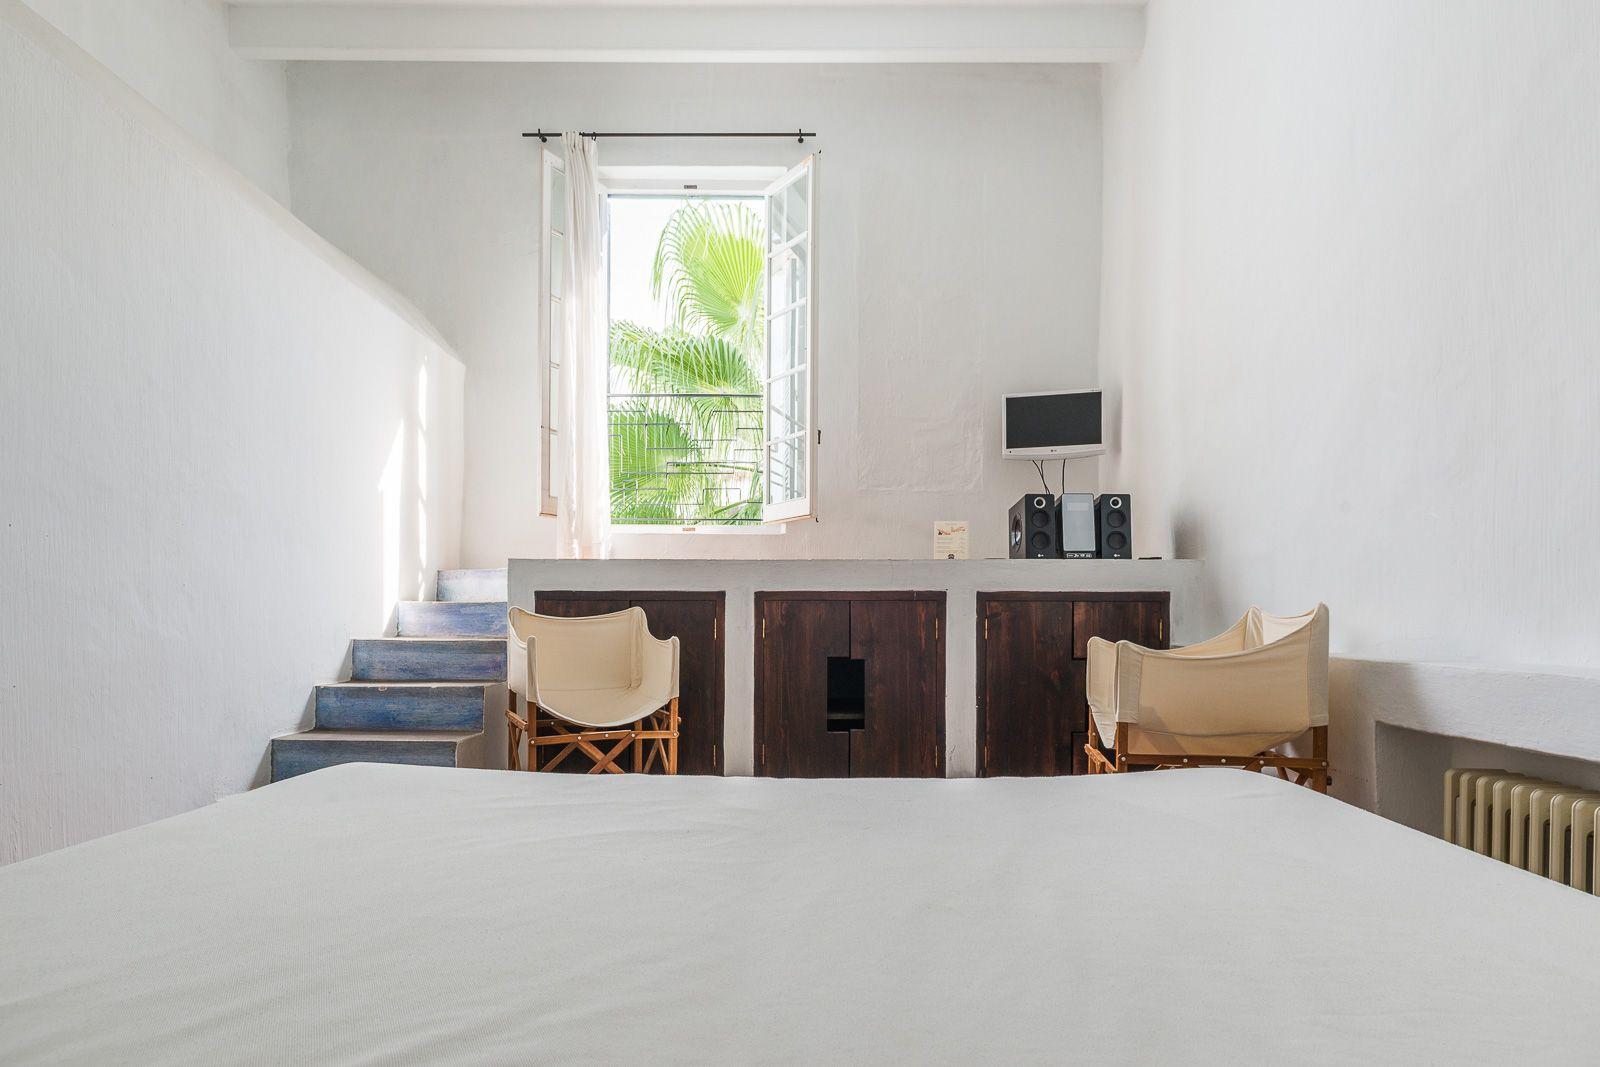 Santa Clara - Hotel Tres Sants Rooms